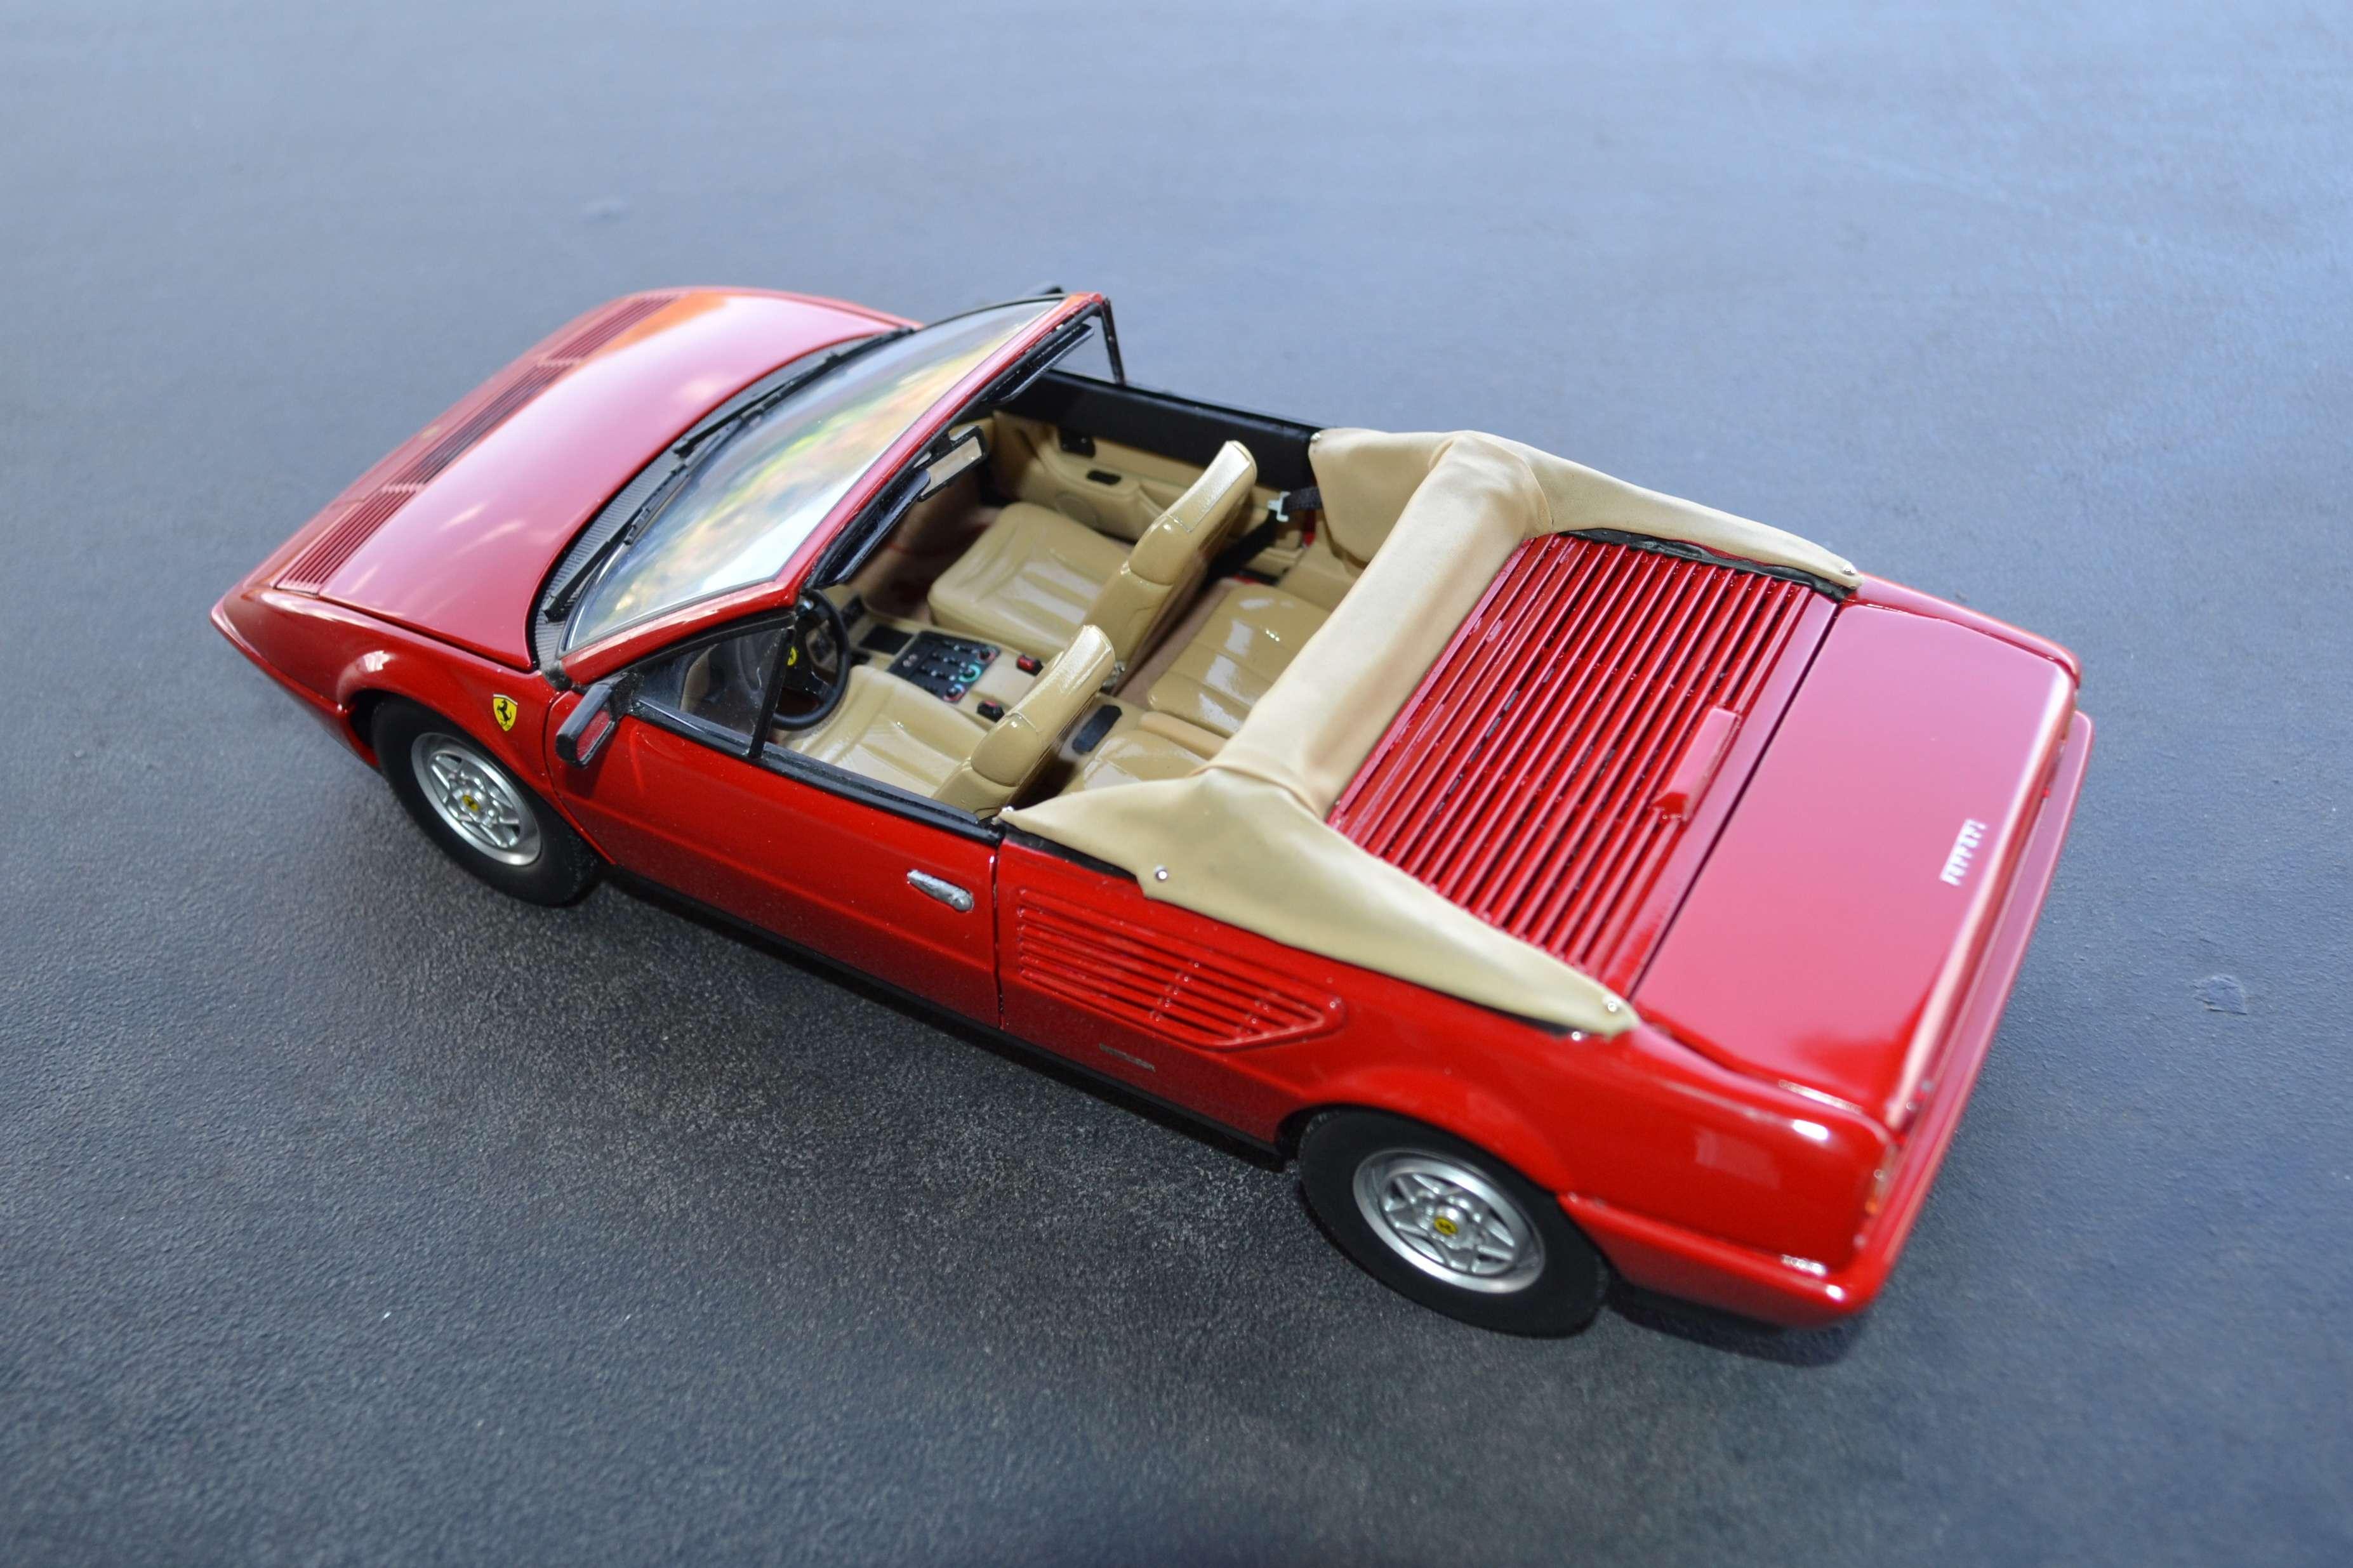 dsc1180w Fabulous Ferrari Mondial 8 Super Elite Cars Trend